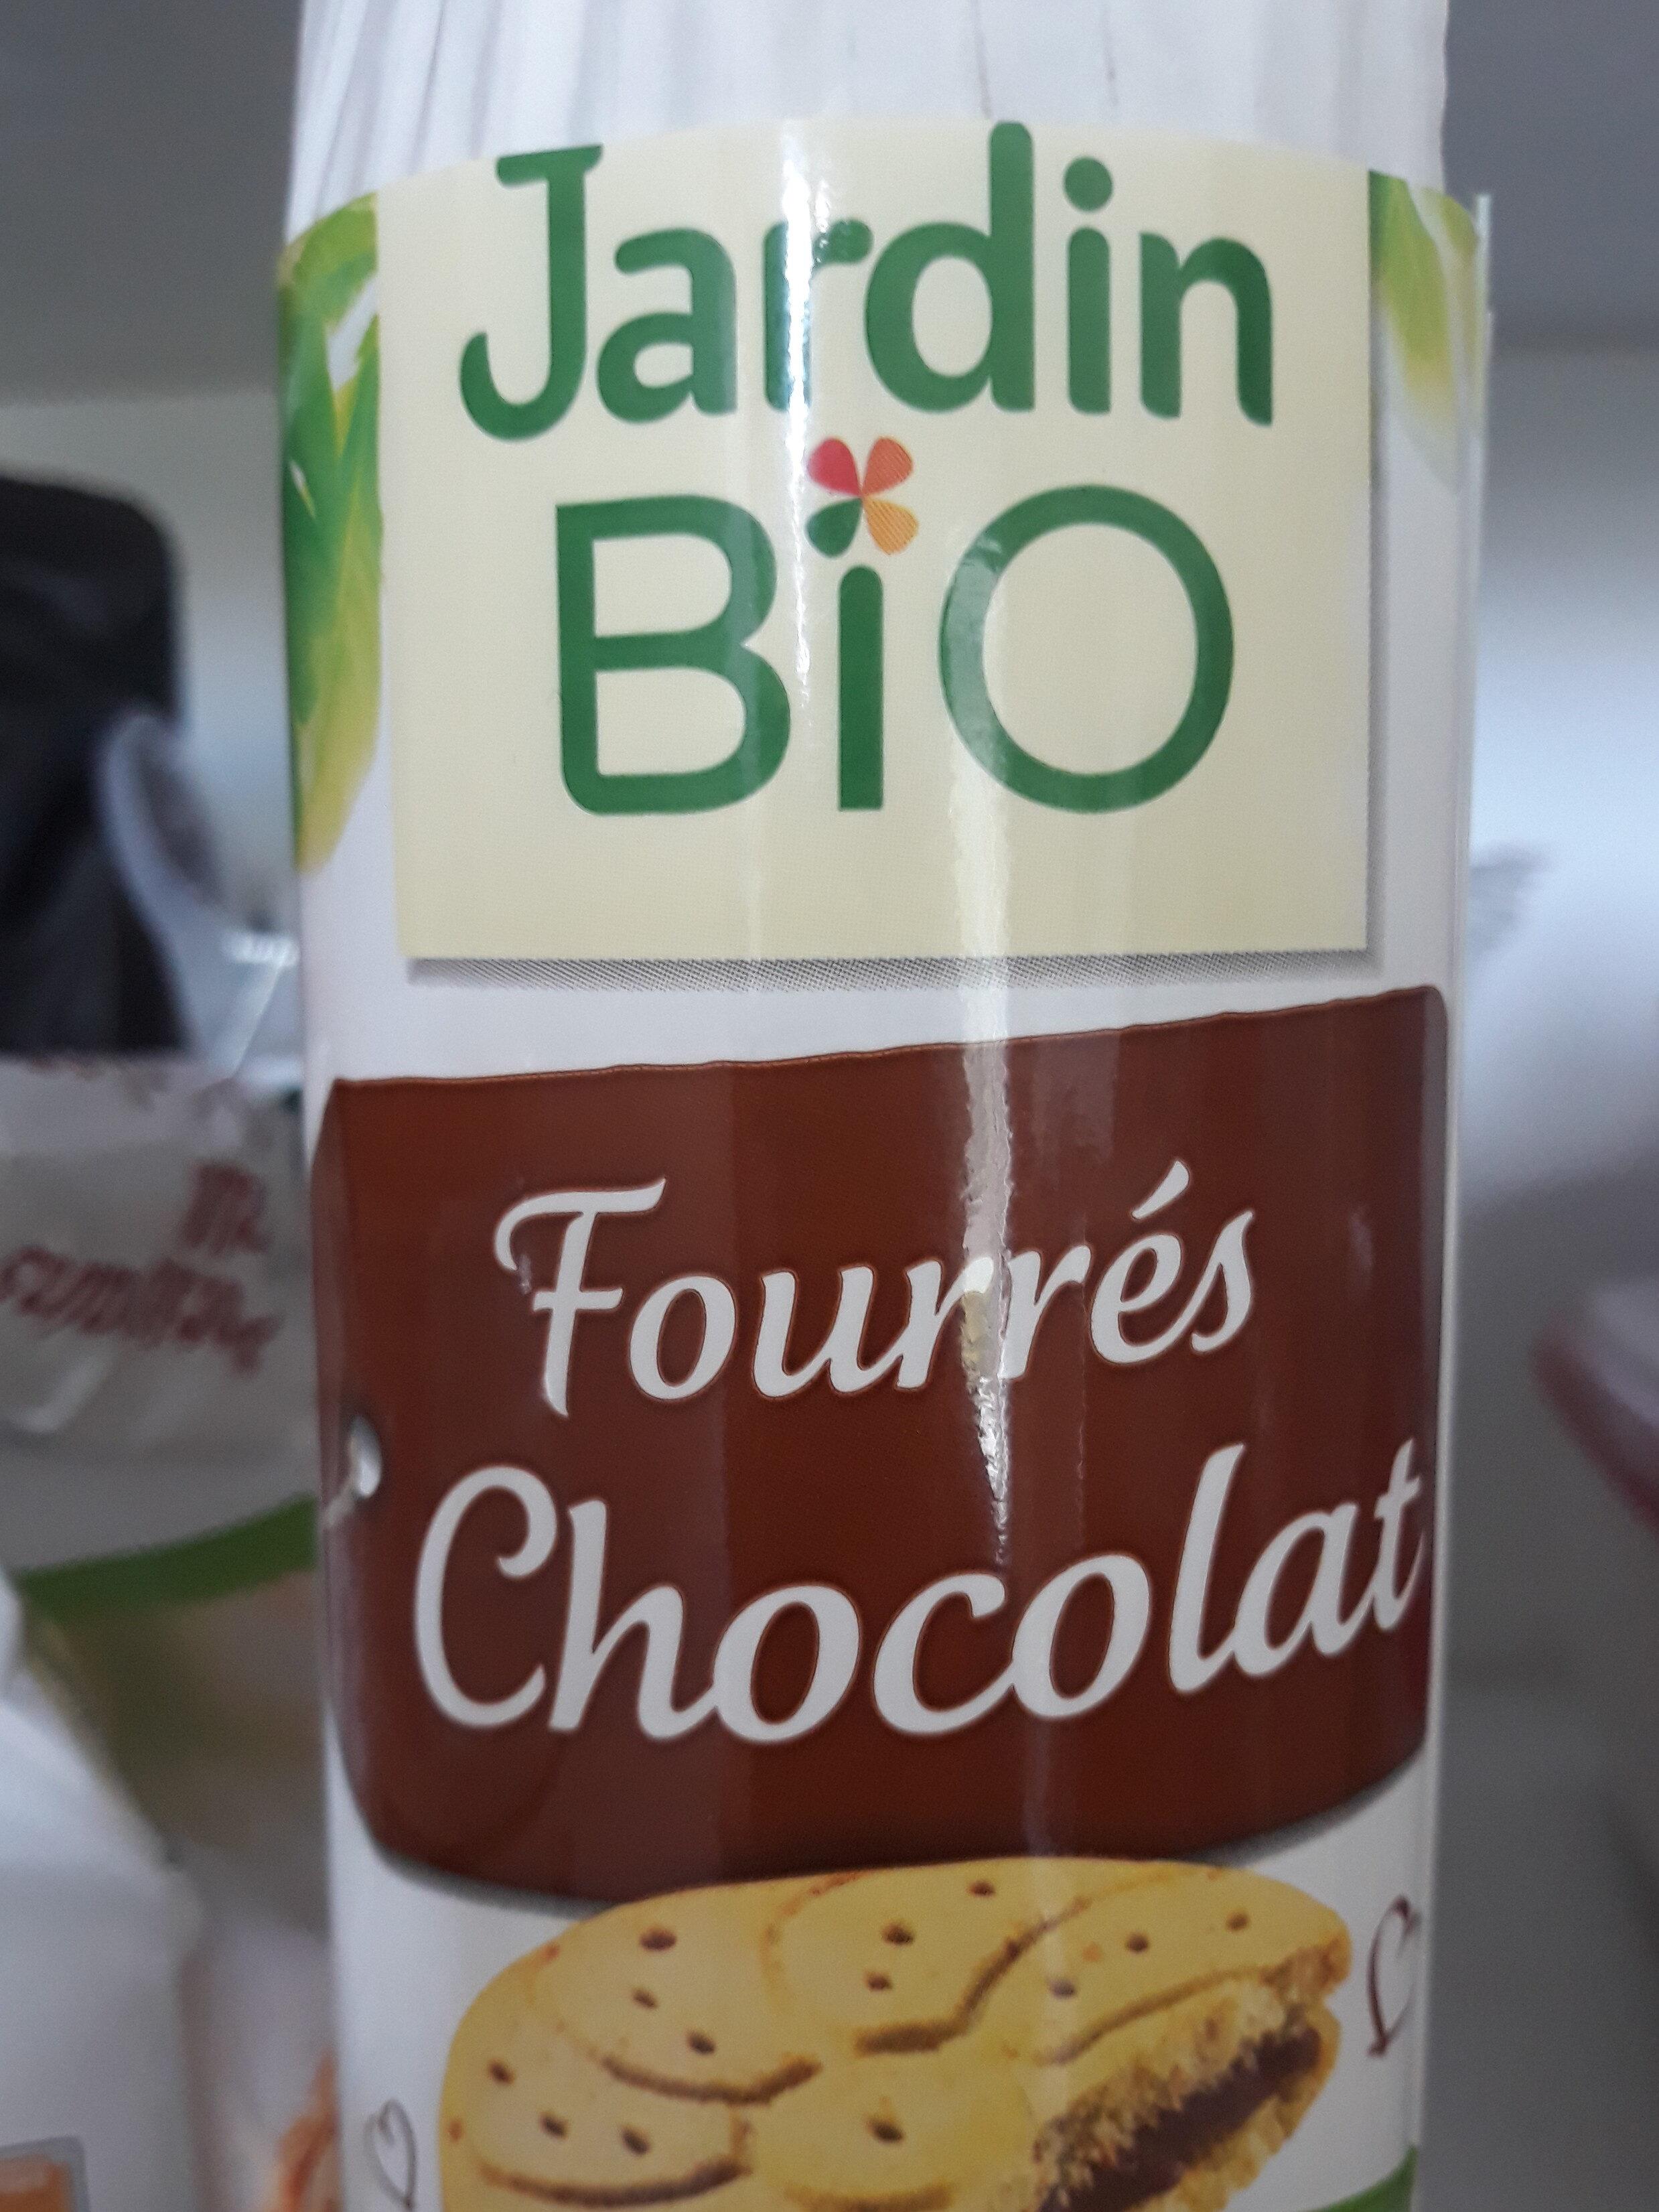 Fourrés chocolat Jardin Bio - Product - fr